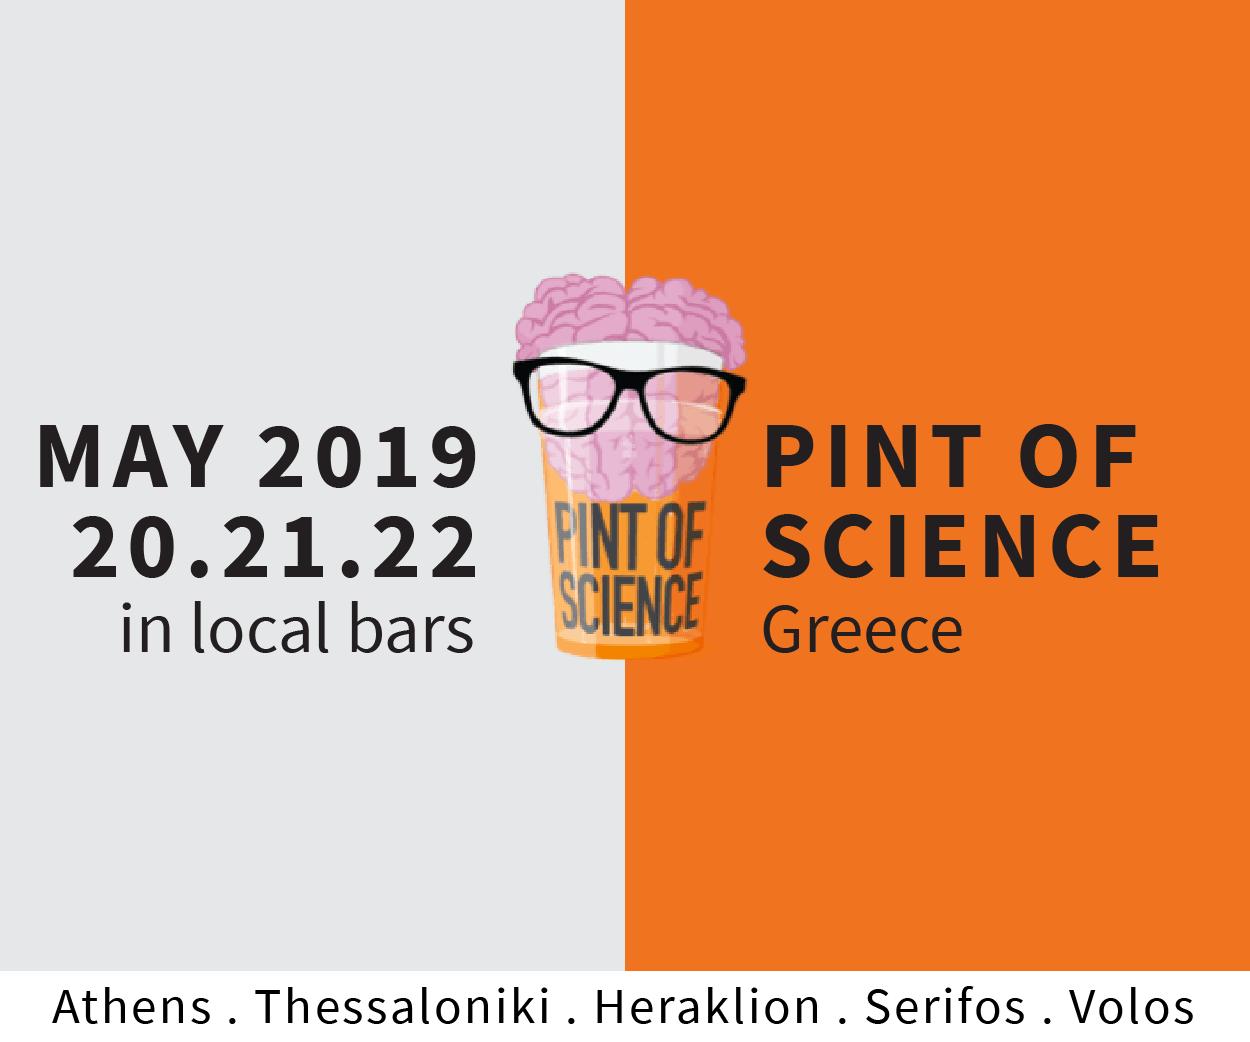 Pint of Science 2019: Η επιστήμη βγαίνει στα bar!